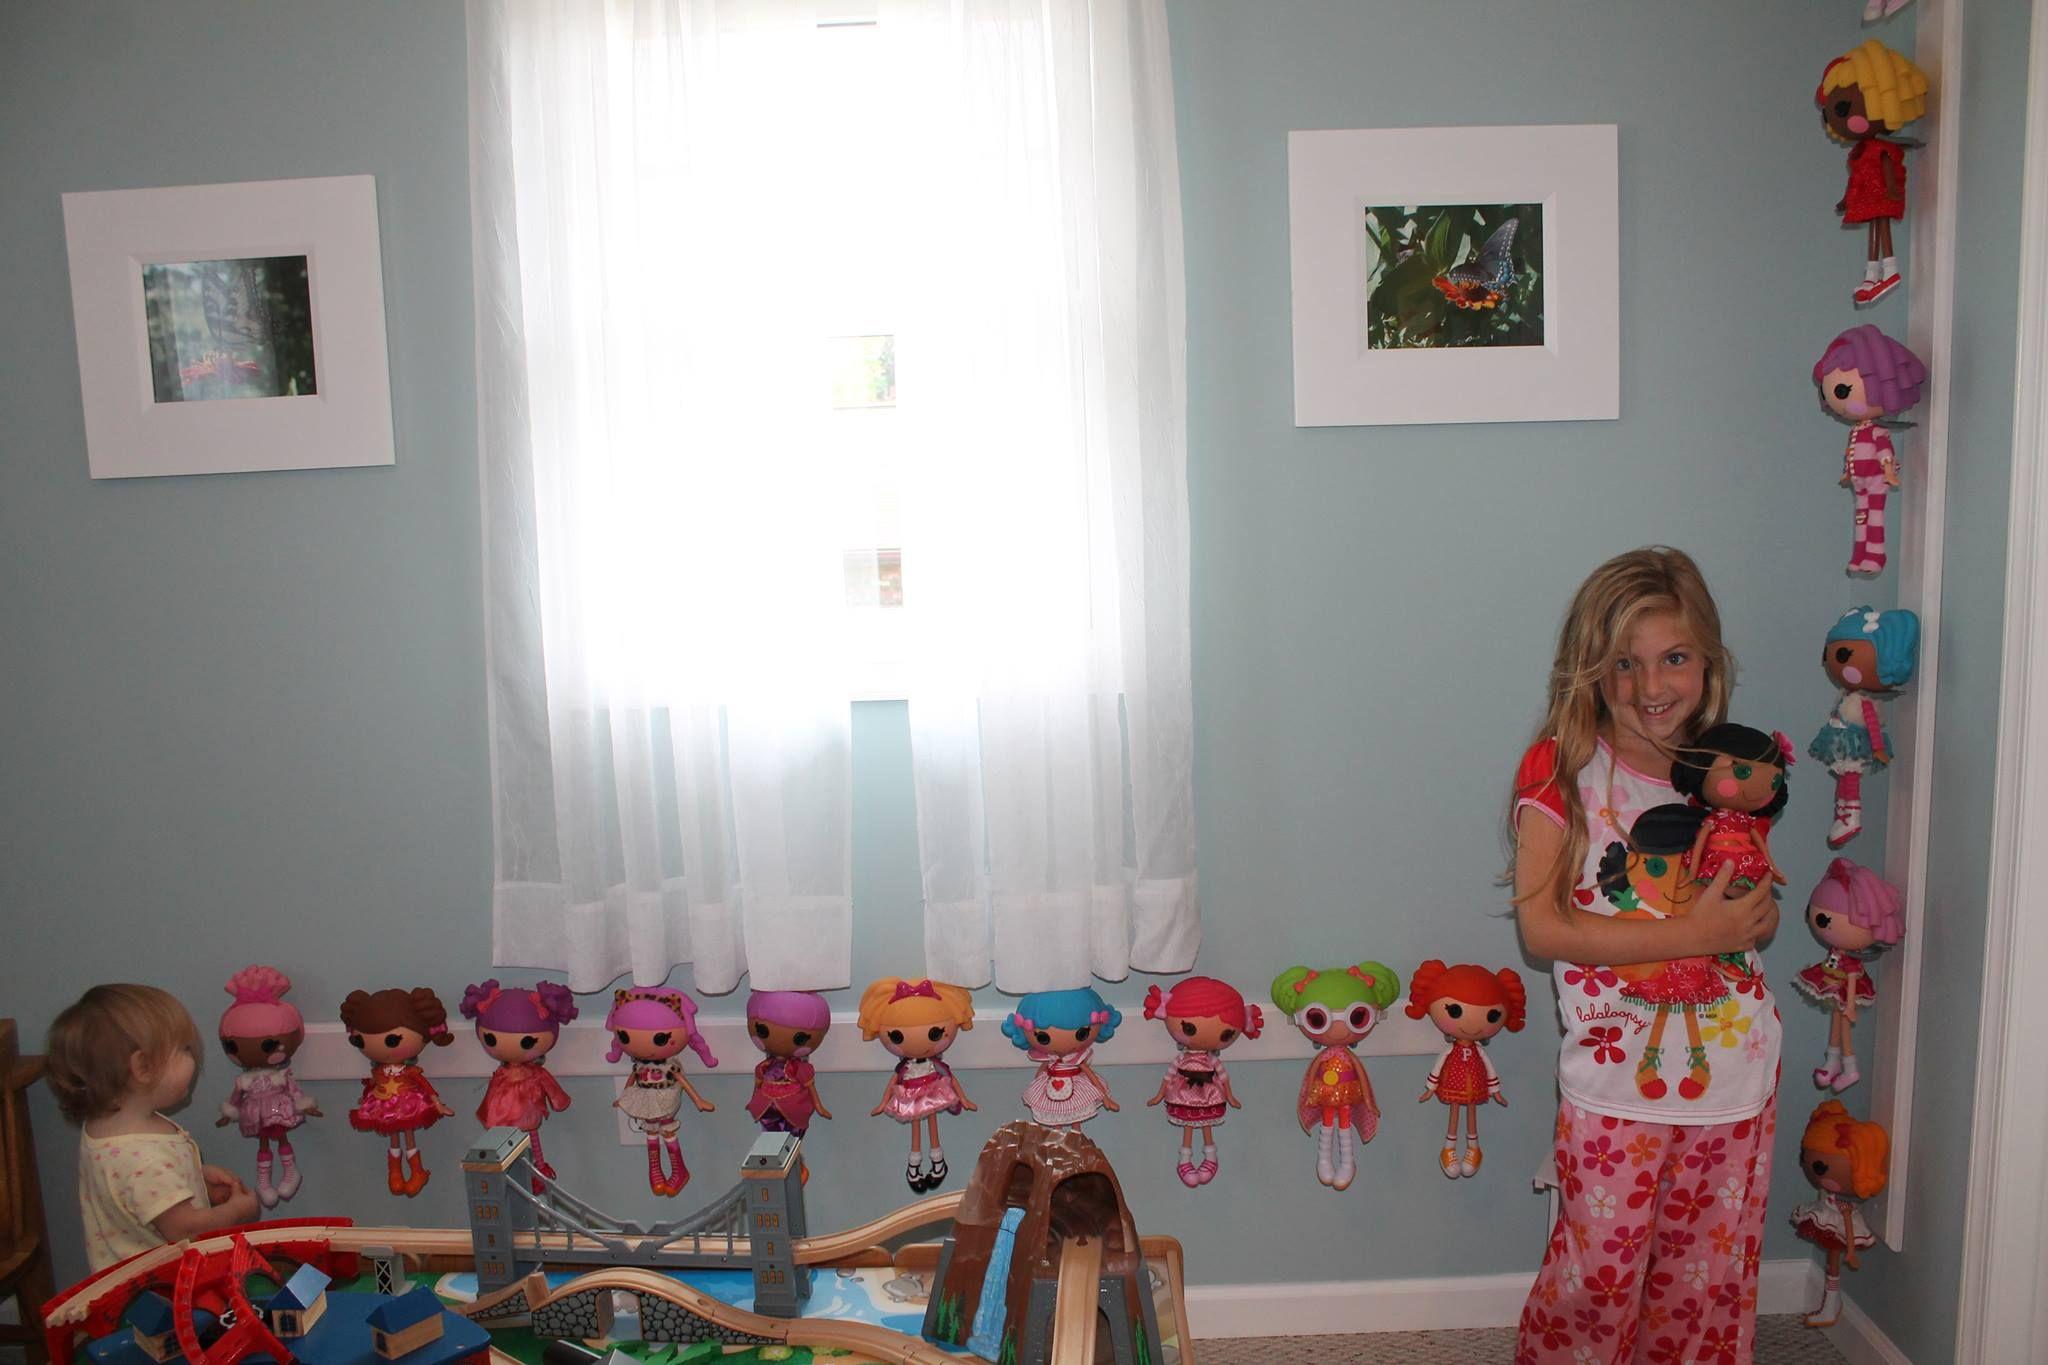 C-shape Hook Holding Dolls To Board